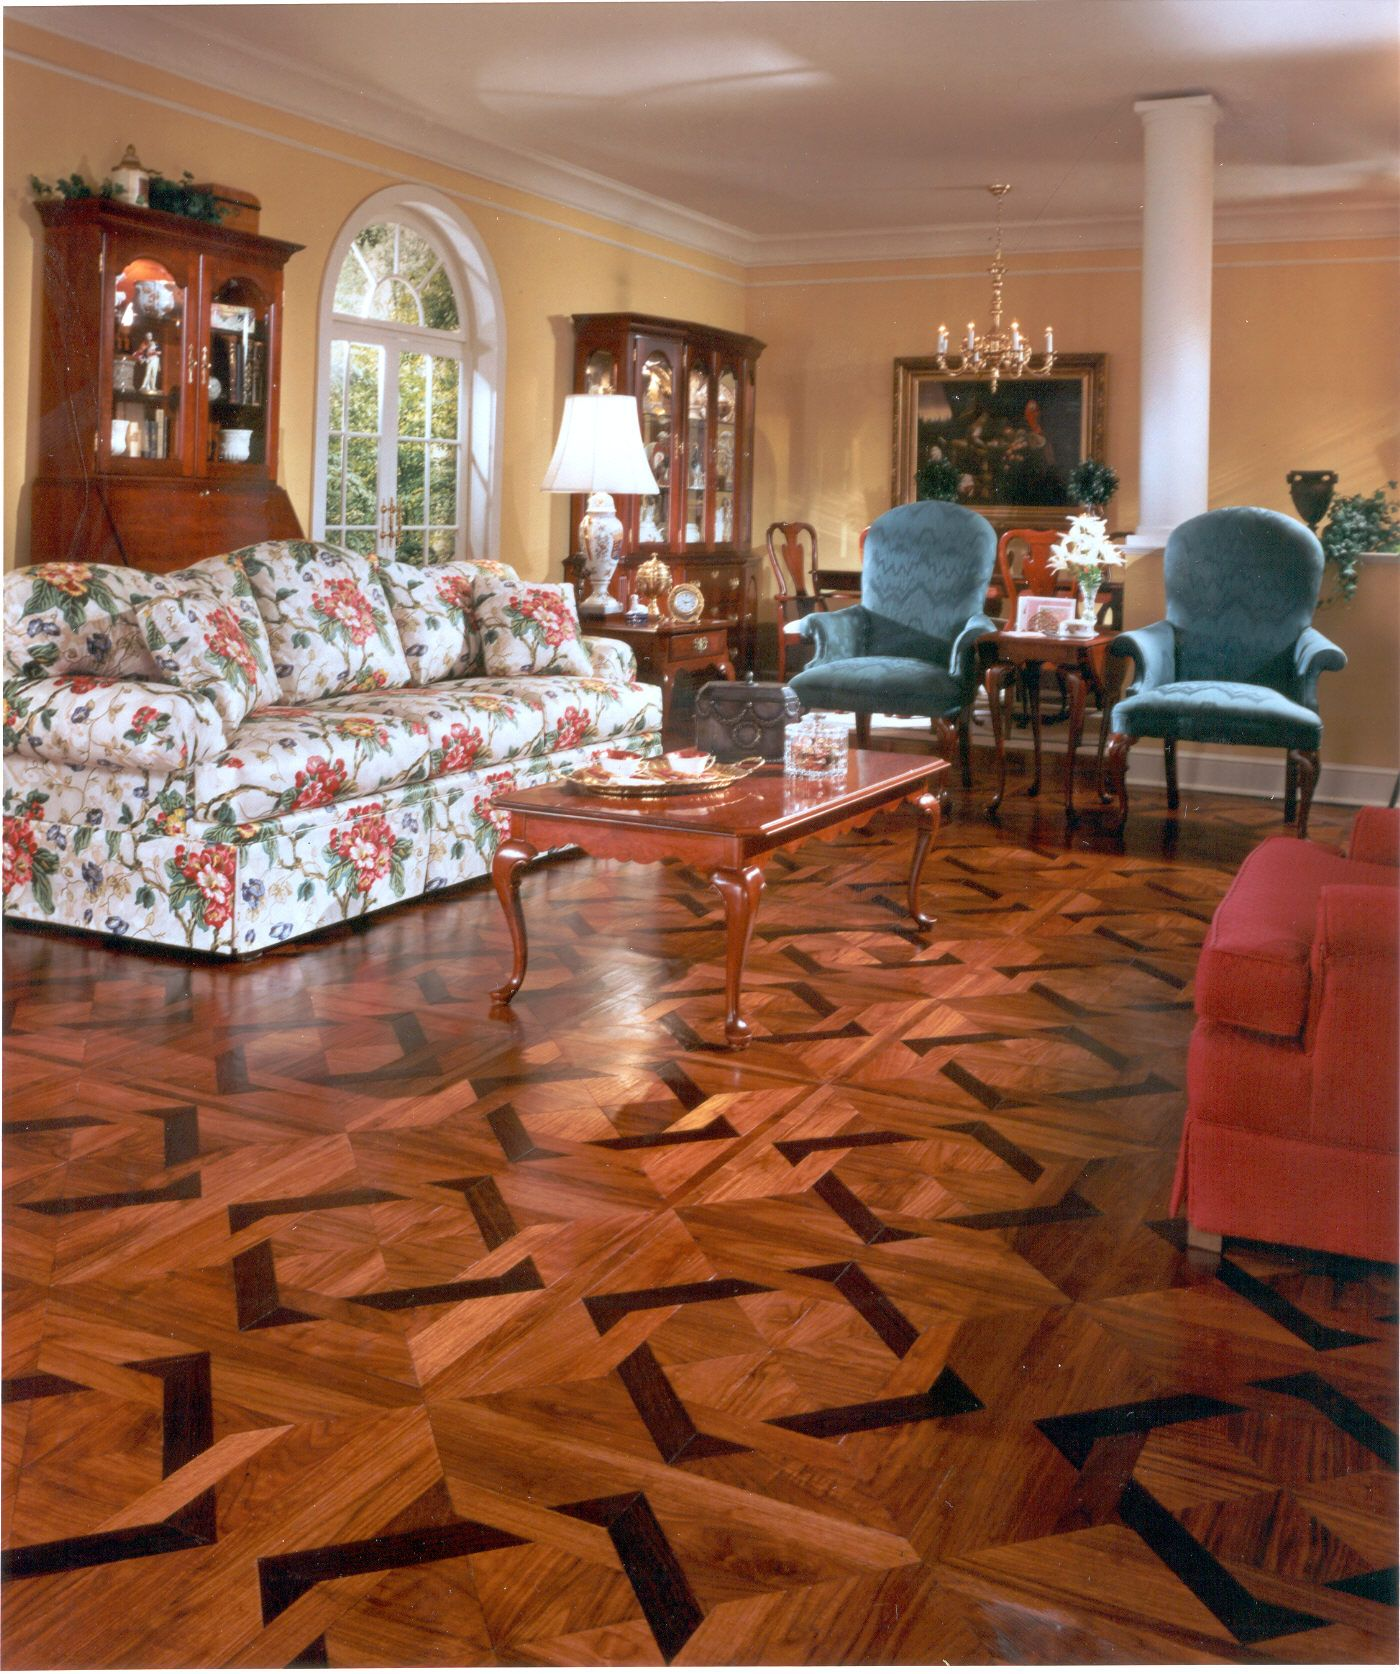 wood floor designs | Product Listing | Custom Classic Wood Flooring |  Kentucky Woodfloors . - Wood Floor Designs Custom Flooring With Wood Inlays Can Add A